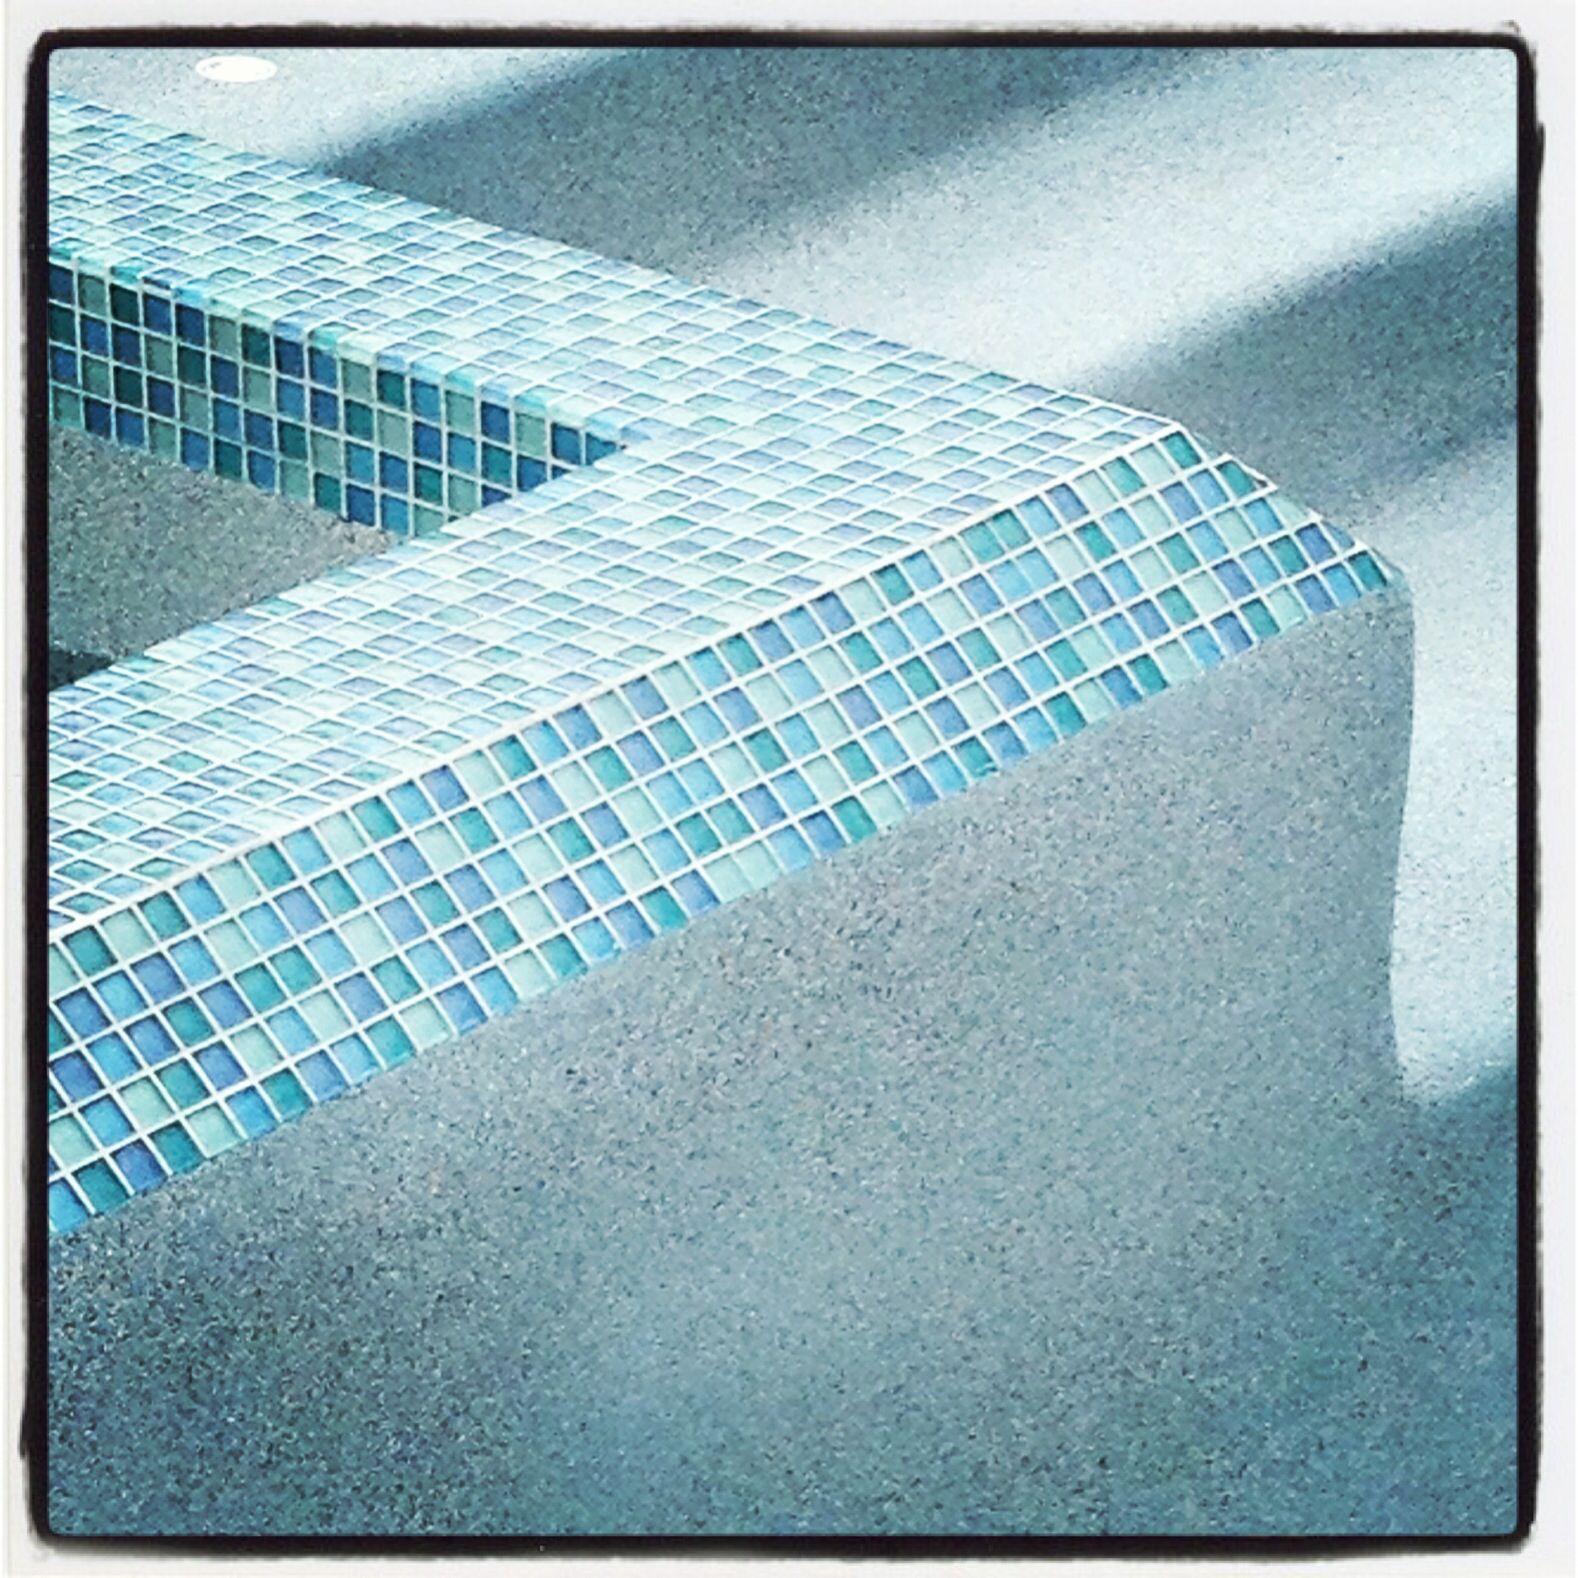 Glass Tile With Pebble Sheen Finish Aquaknotpools Swimming Pools Pinterest Dream Pools